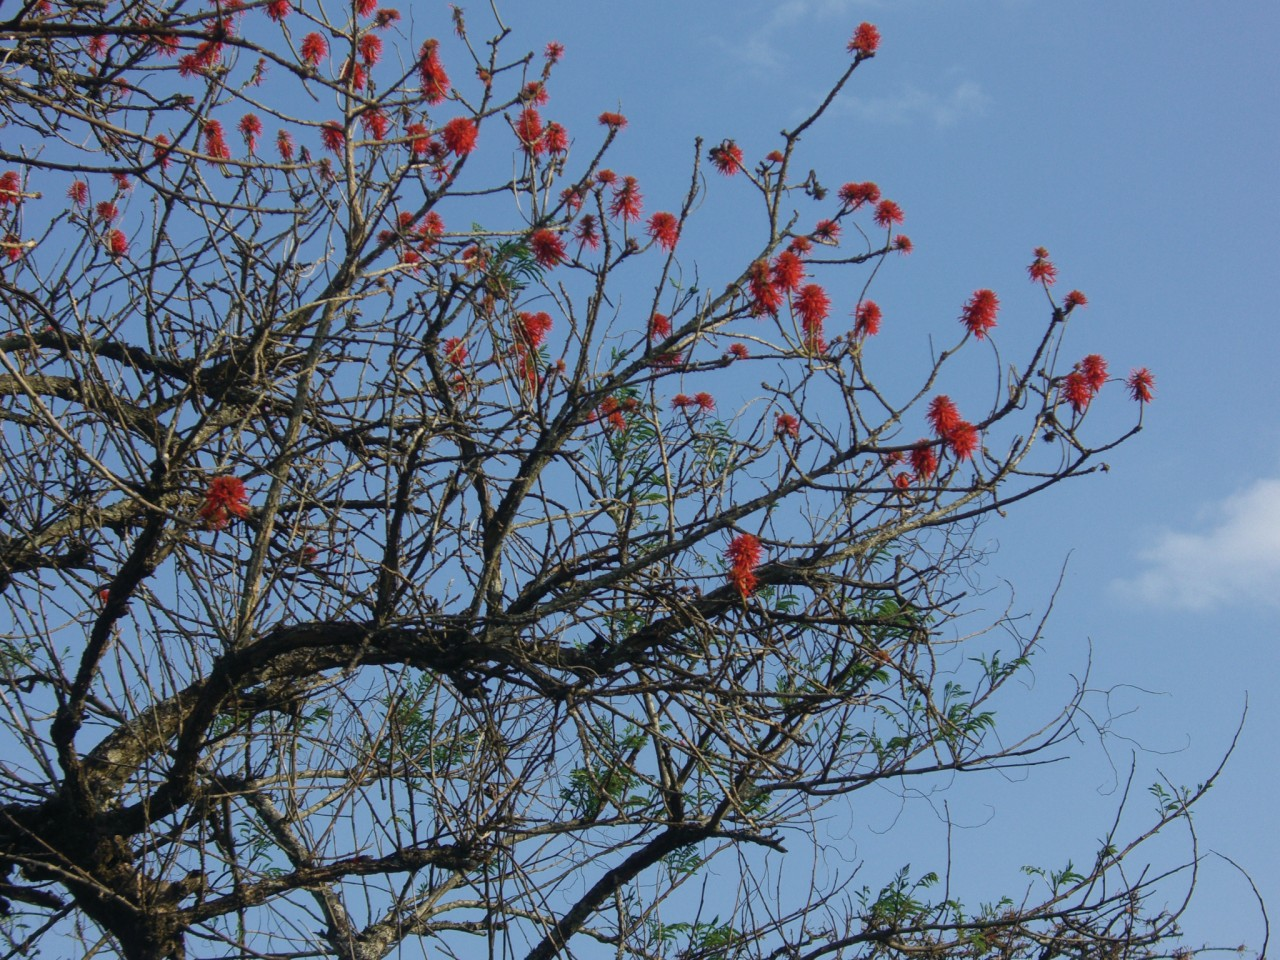 L'érythrine, arbre sacré du Burundi ancien. (© Christine DESLAURIER))